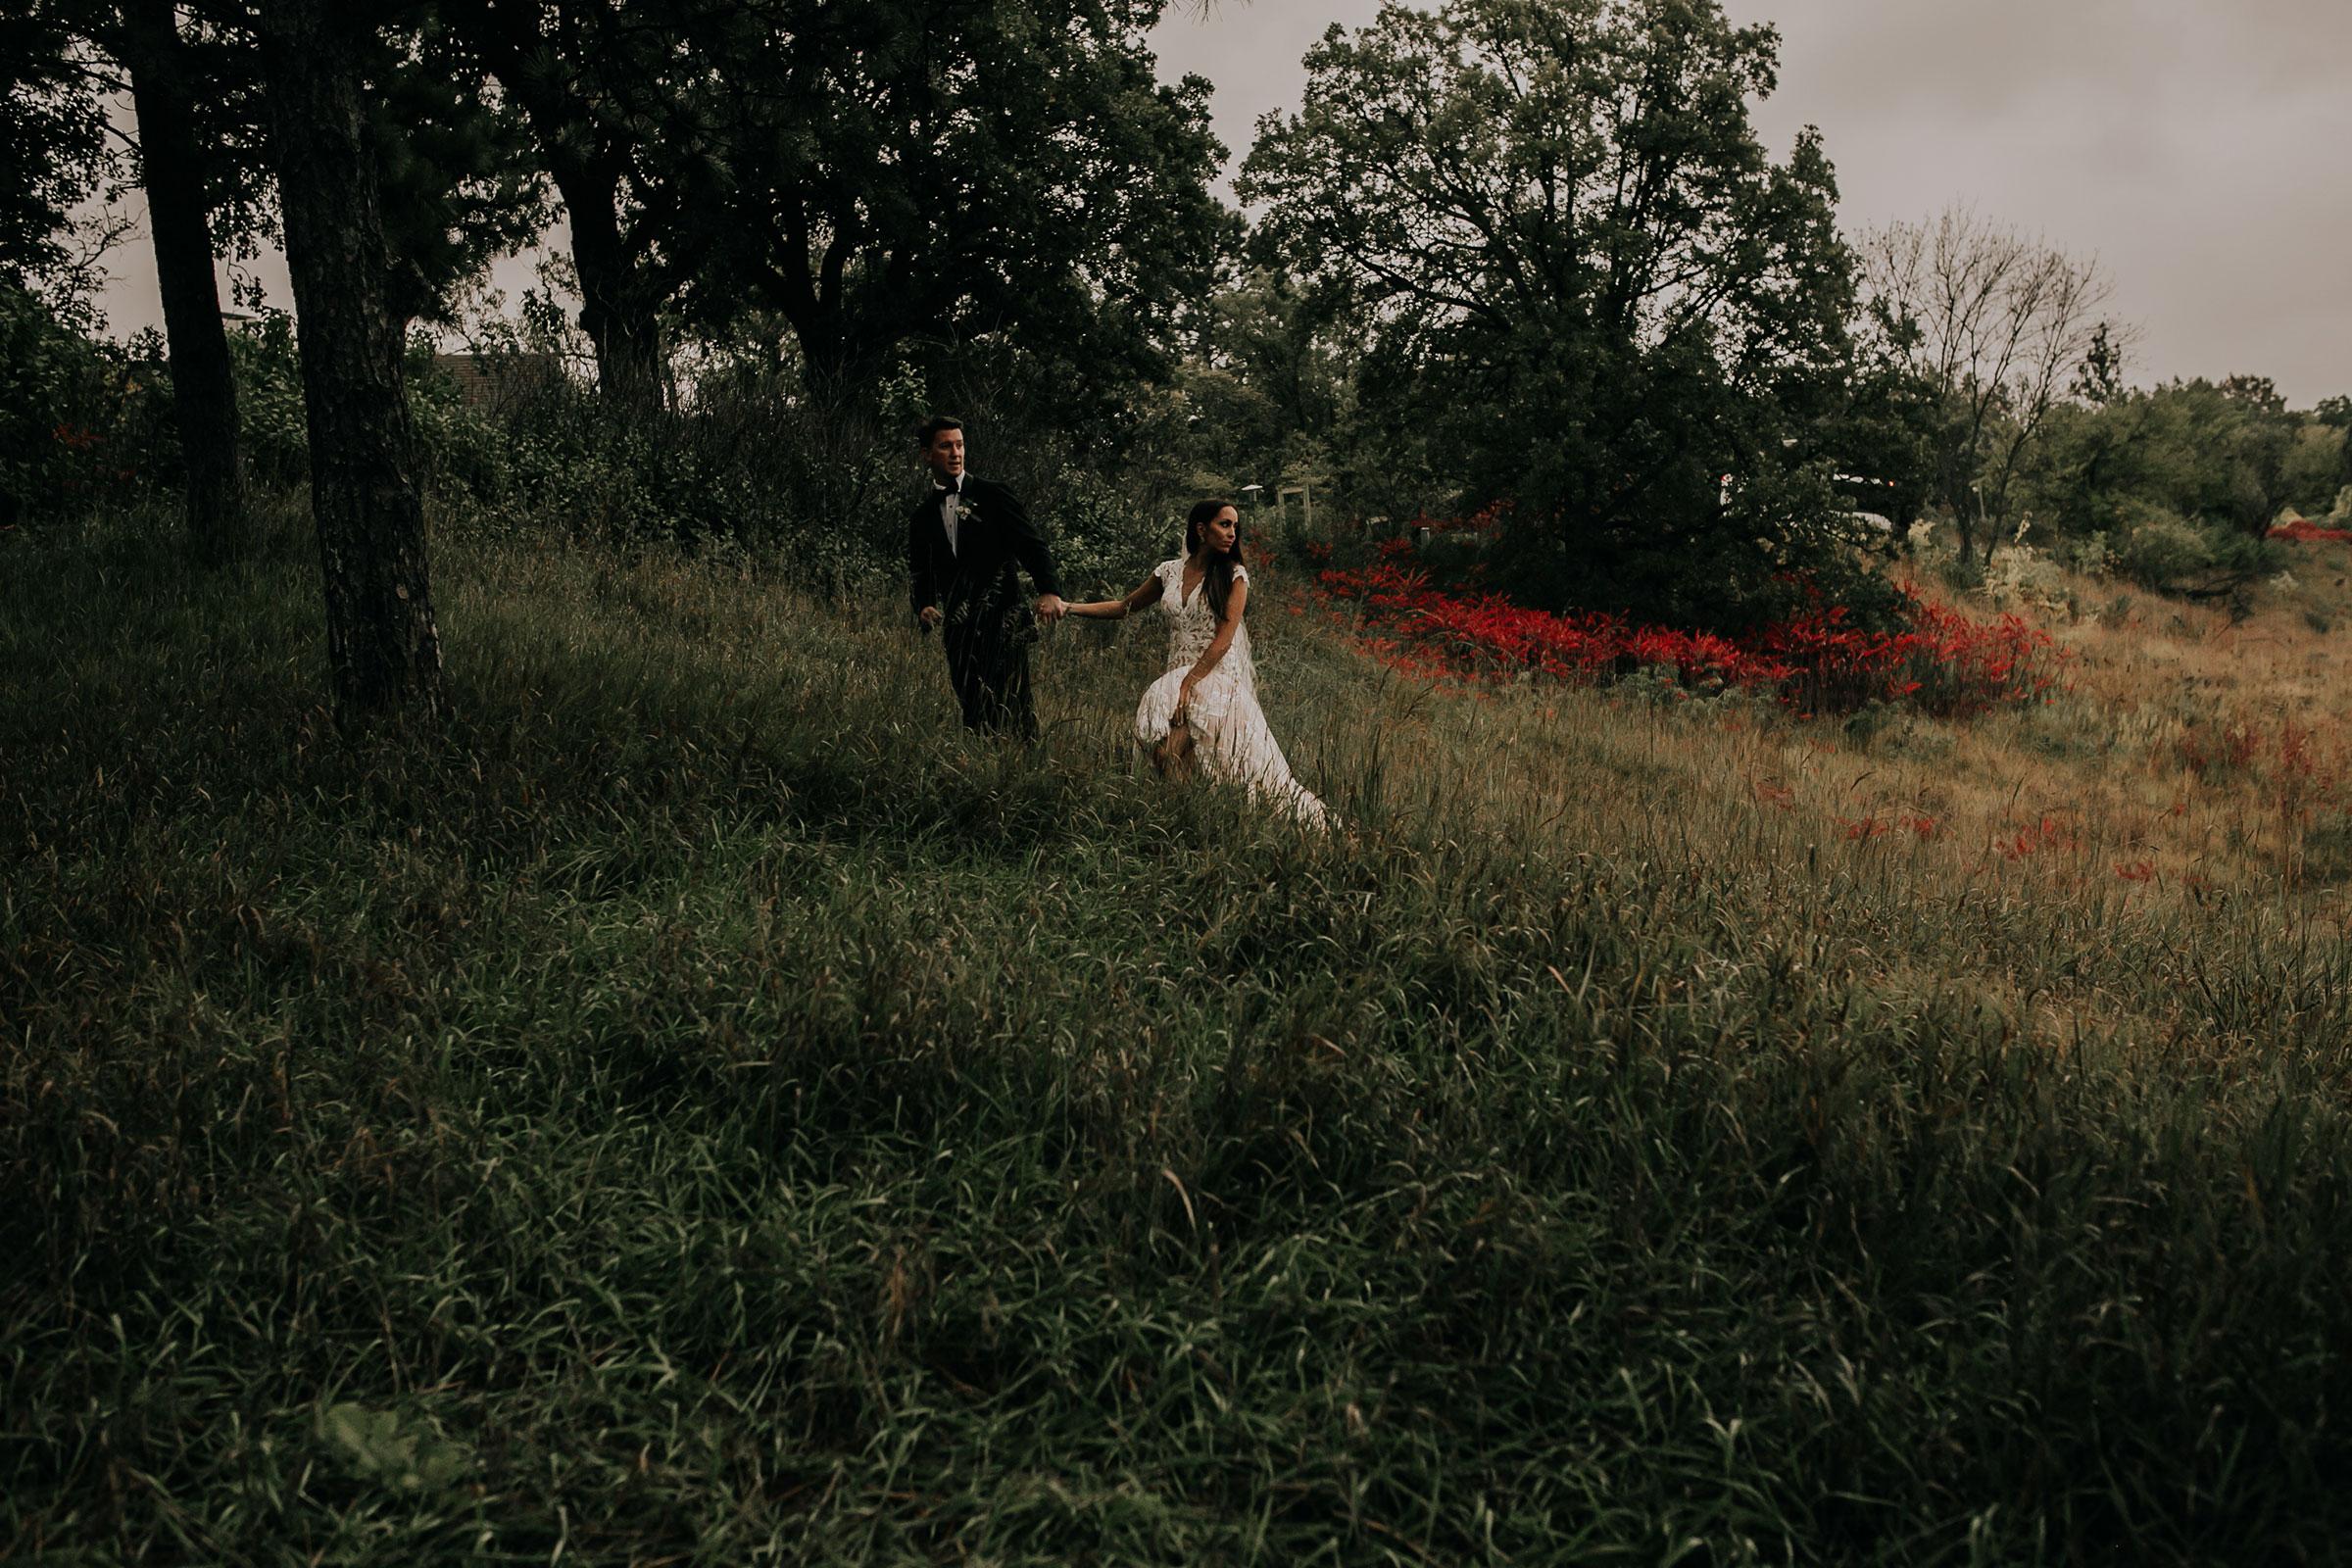 bride-groom-walking-up-hill-at-park-omaha-nebraska-raelyn-ramey-photography.jpg